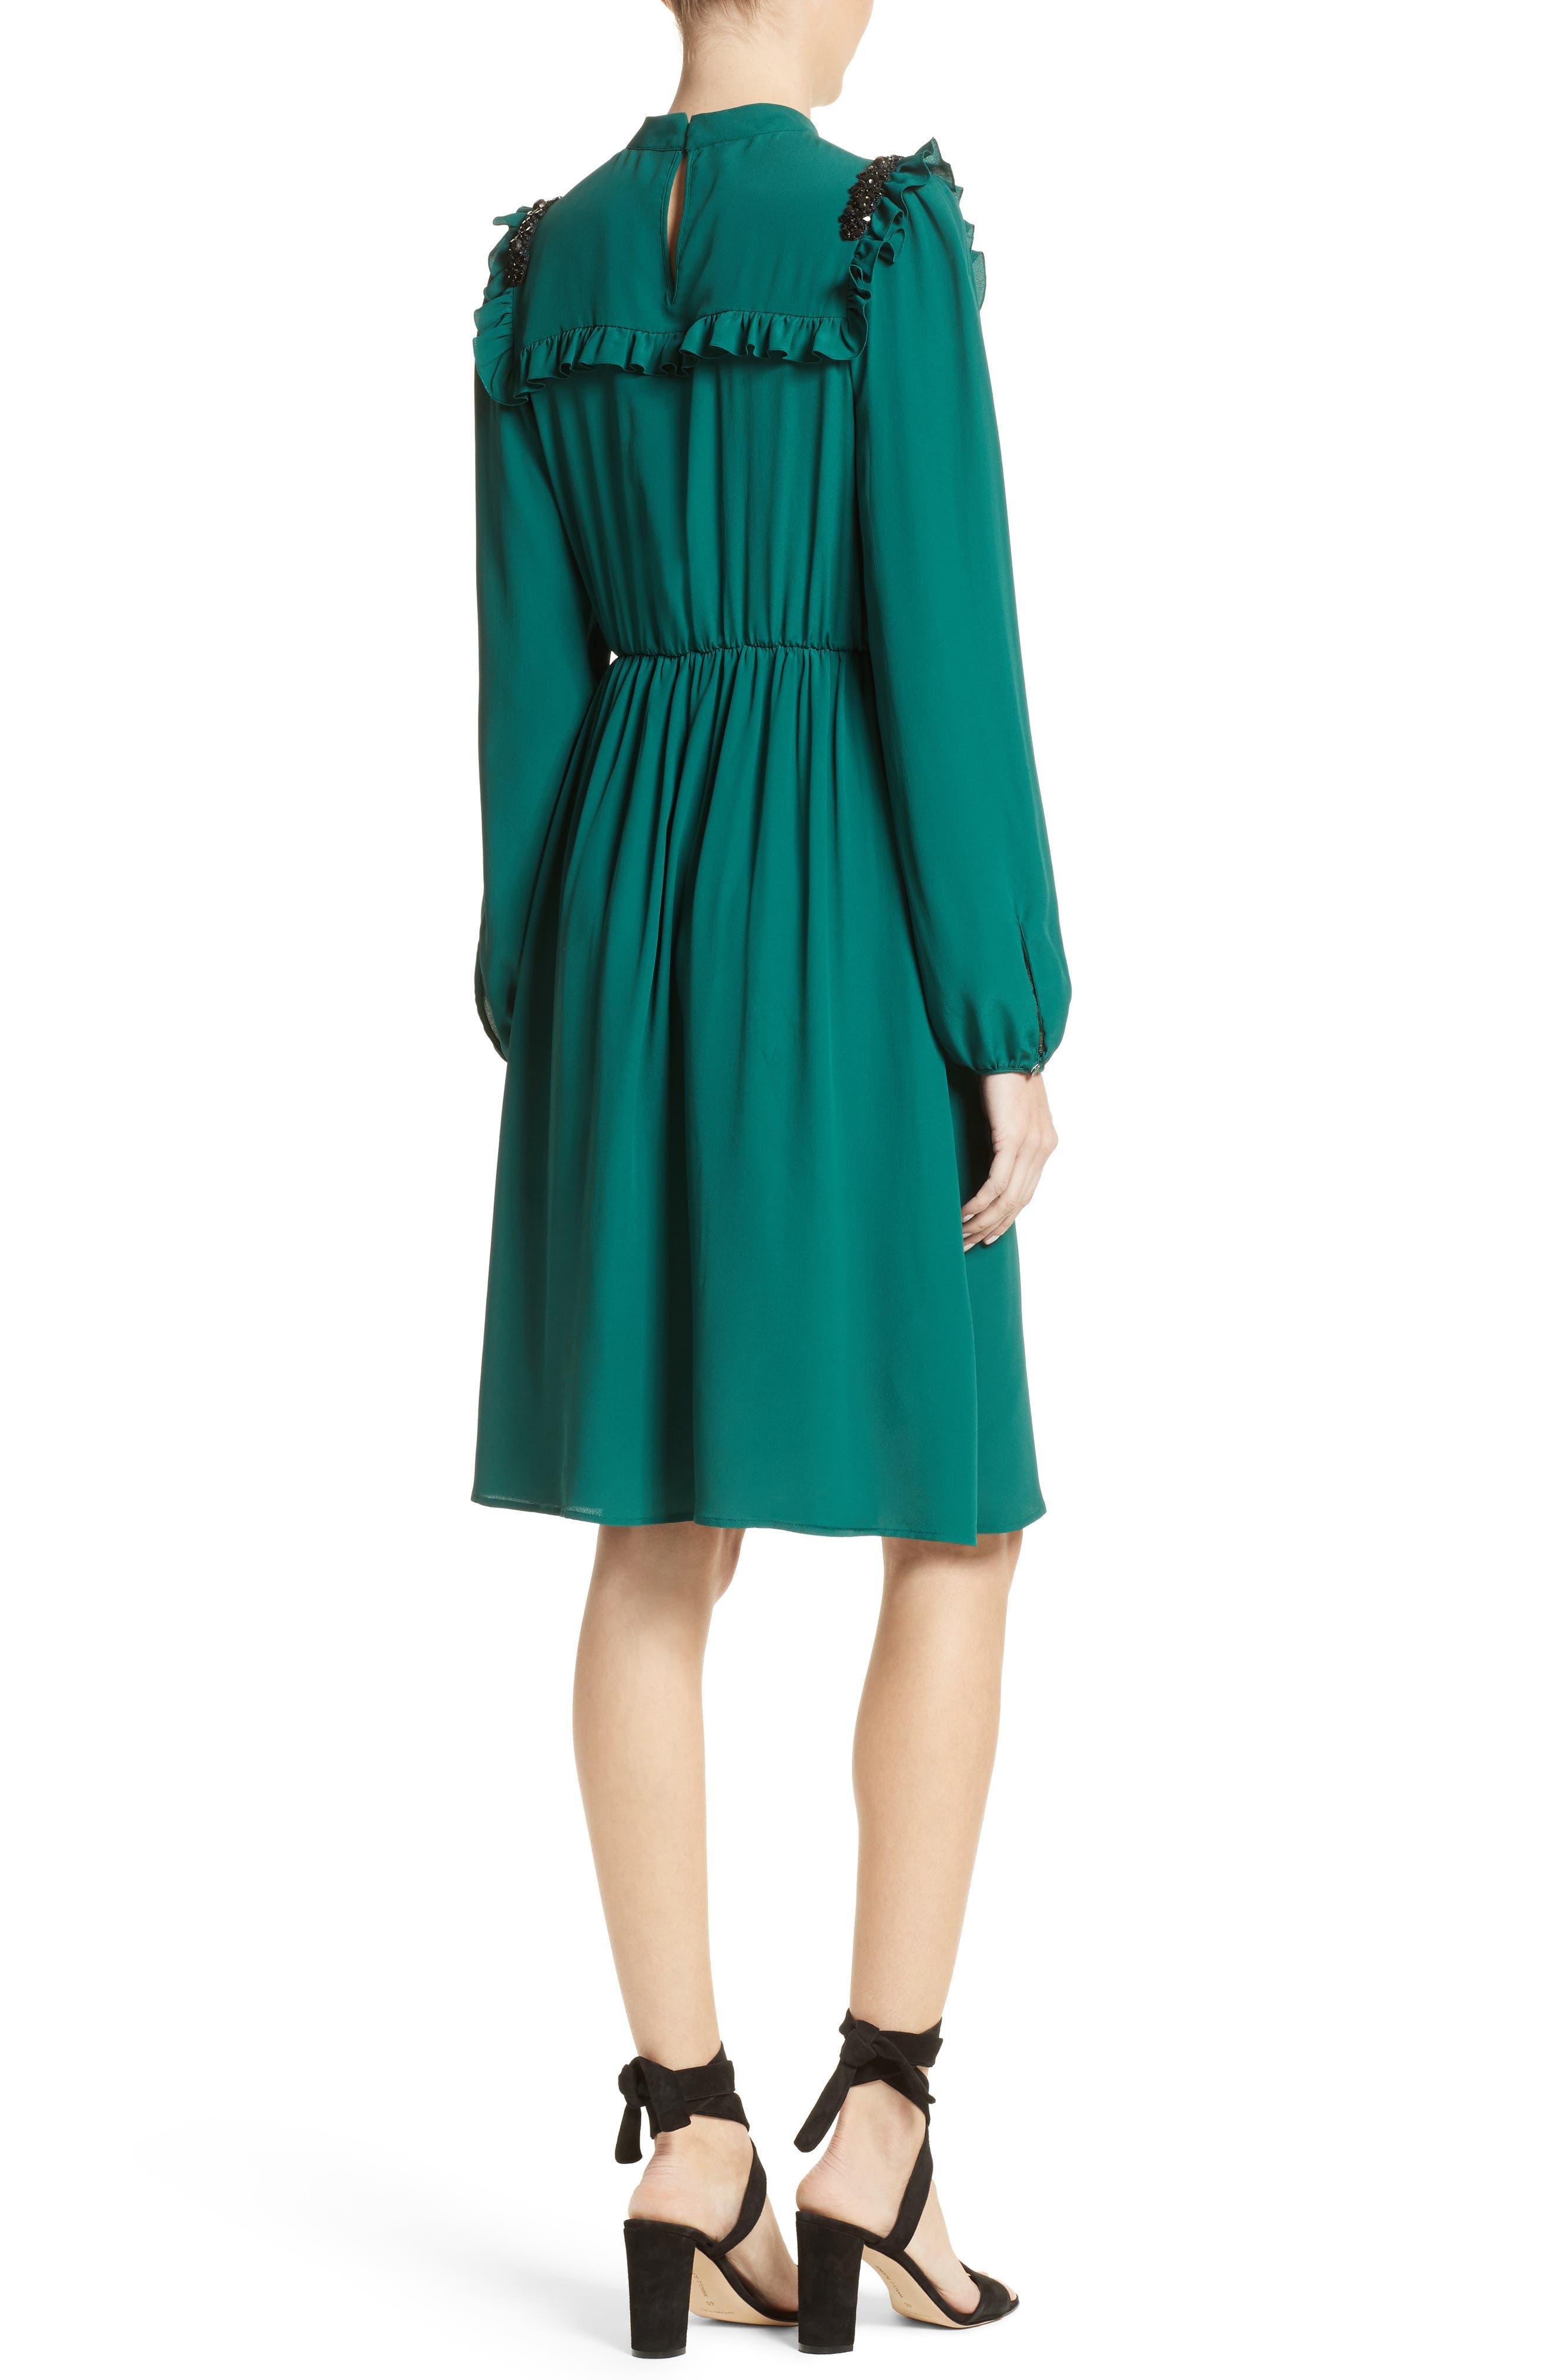 Crystal Embellished Ruffle Dress,                             Alternate thumbnail 2, color,                             300